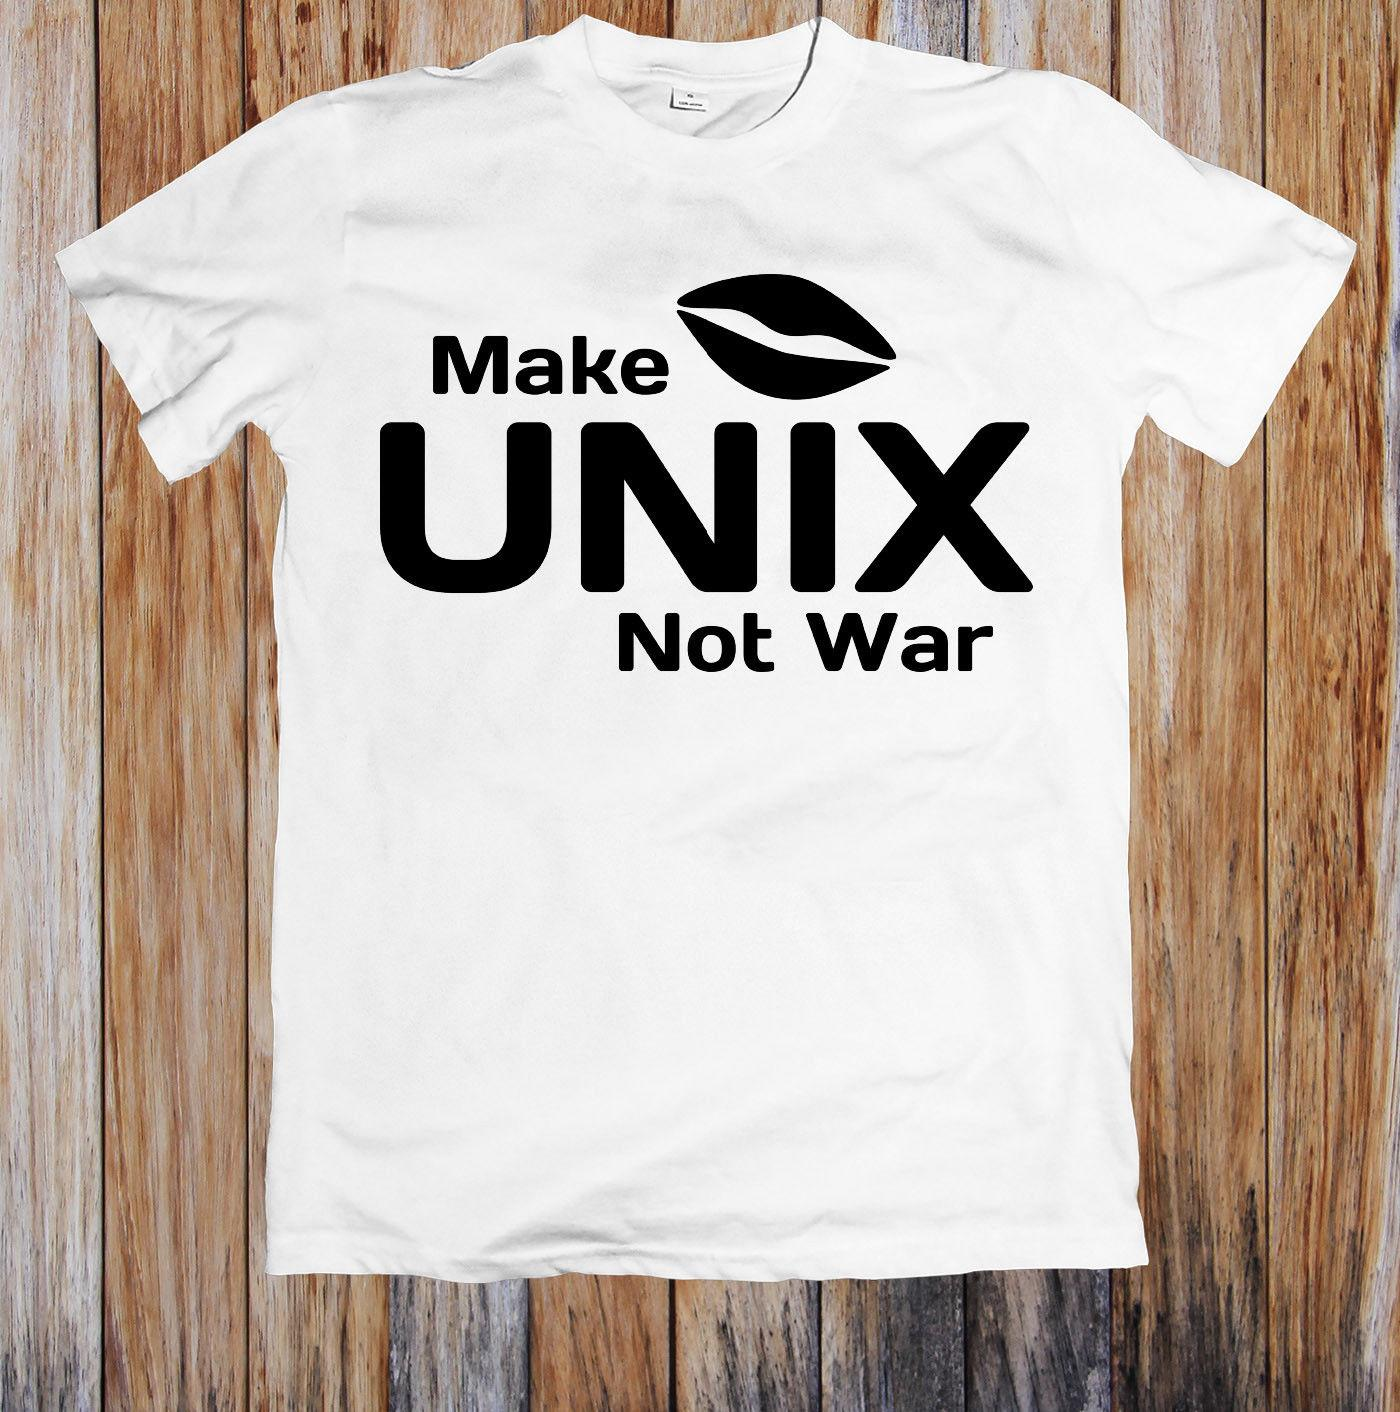 c510e6cd3 MAKE UNIX NOT WAR UNISEX T SHIRT T Shirt Shop Online Crazy T Shirt From  Xsy11tshirt, $12.05| DHgate.Com